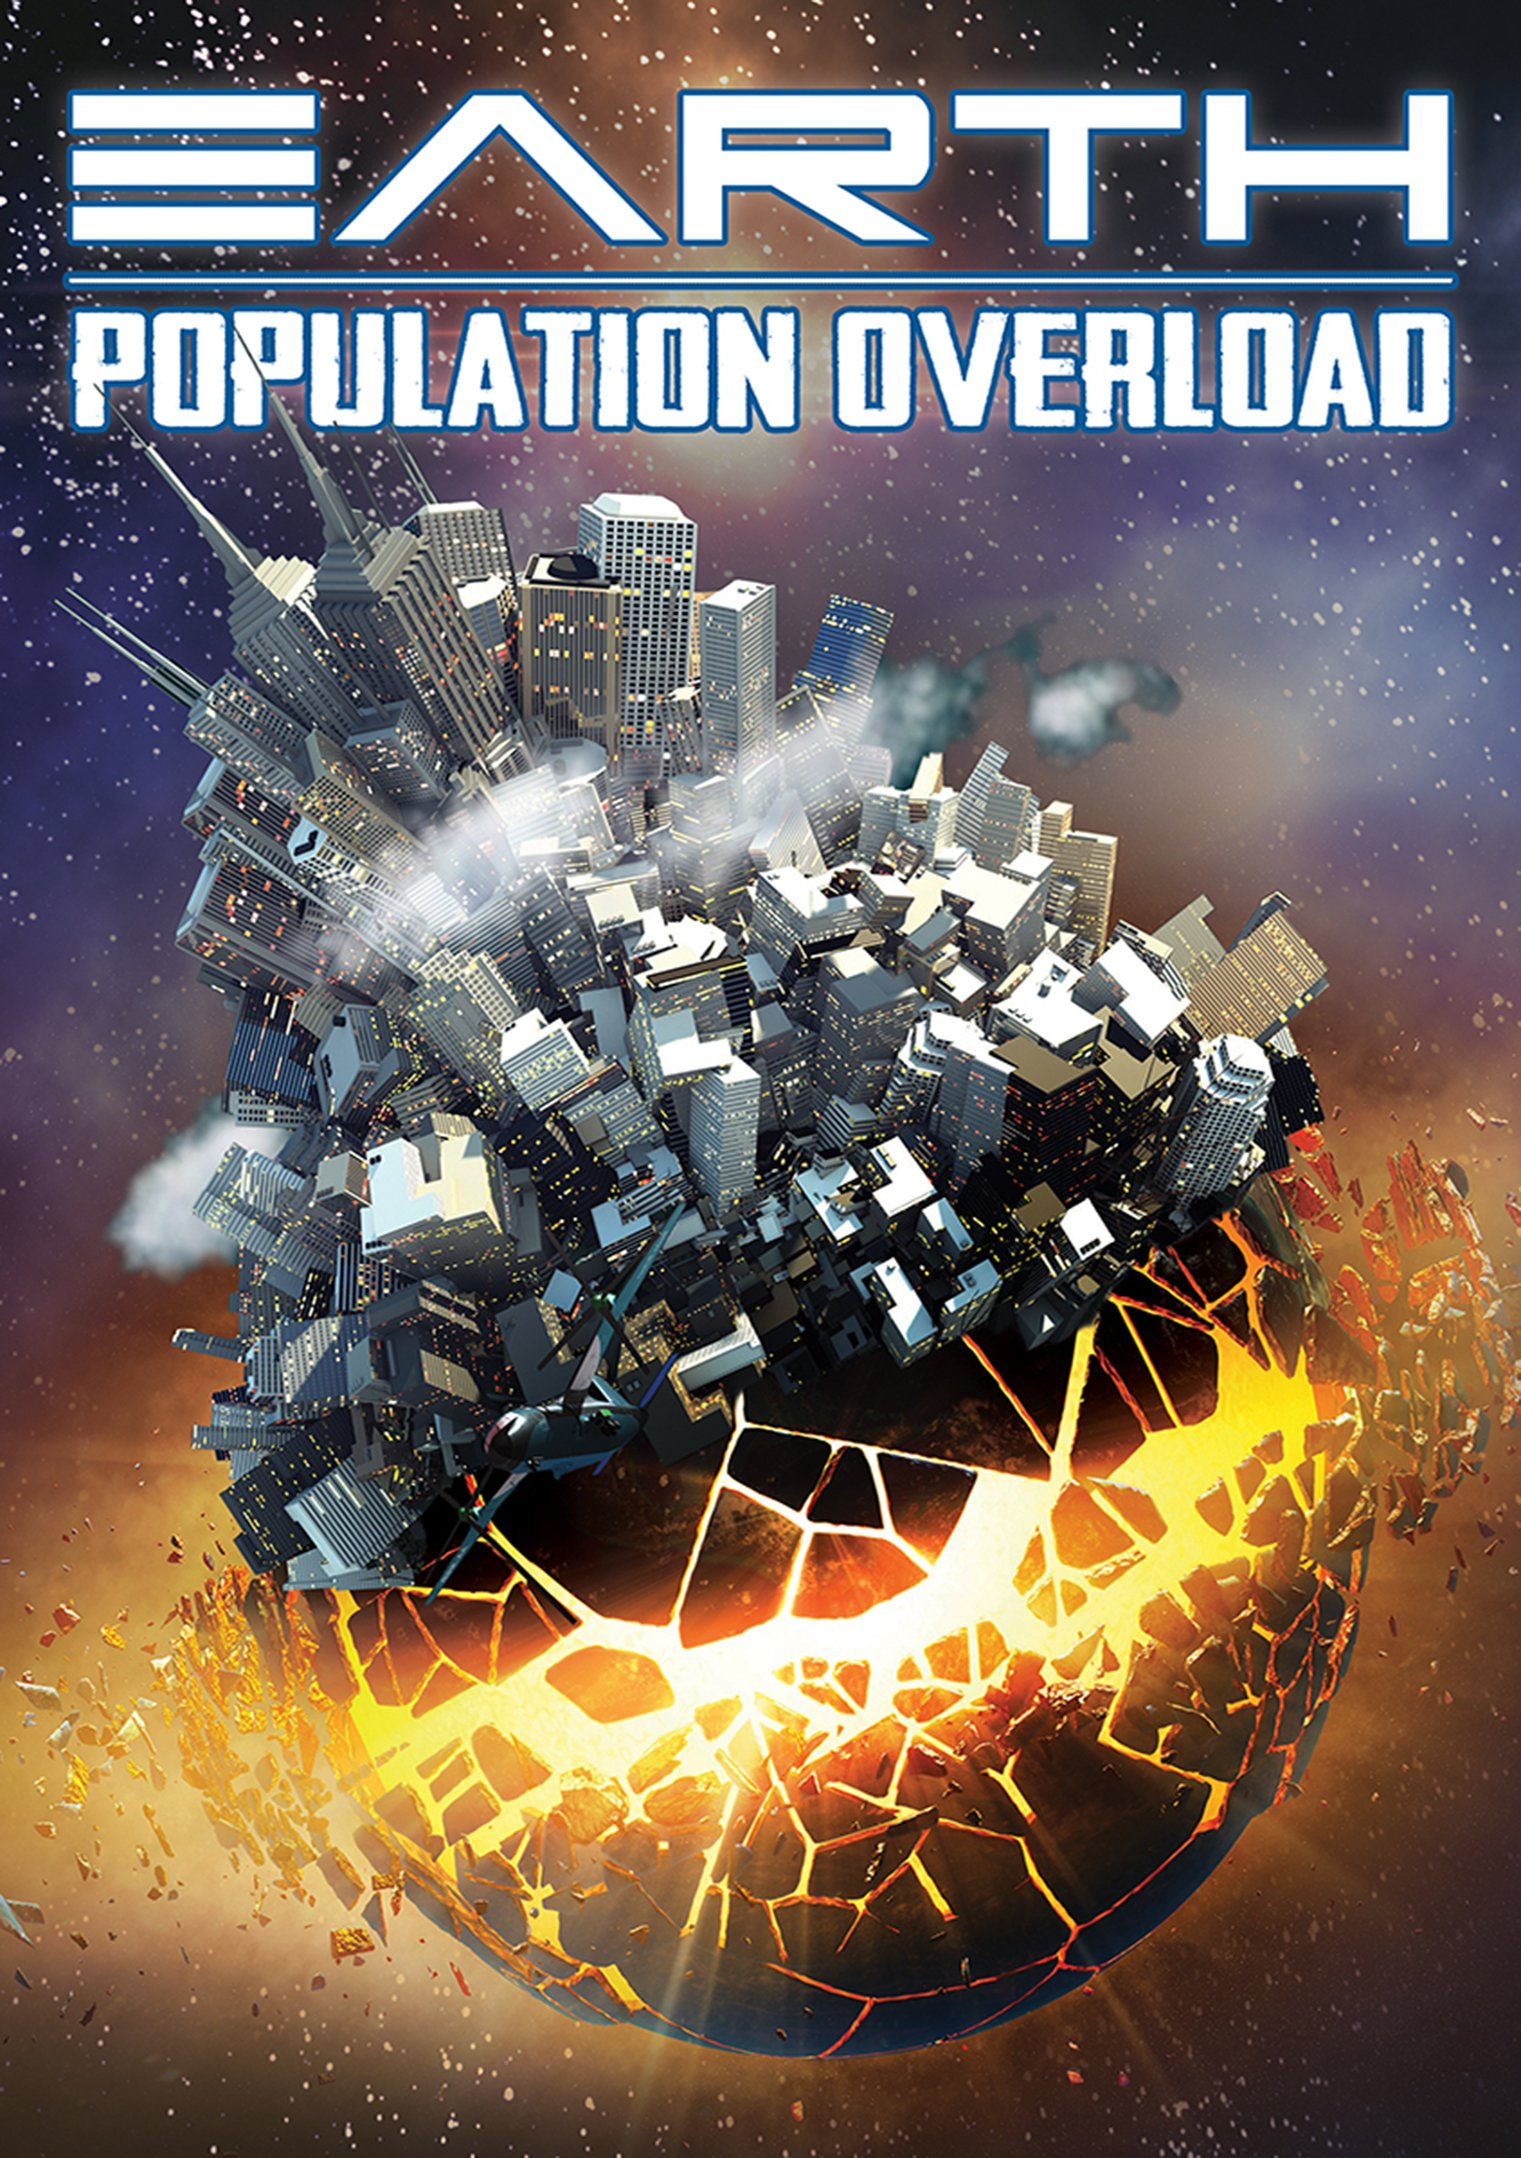 DVD : Earth: Population Overload (DVD)